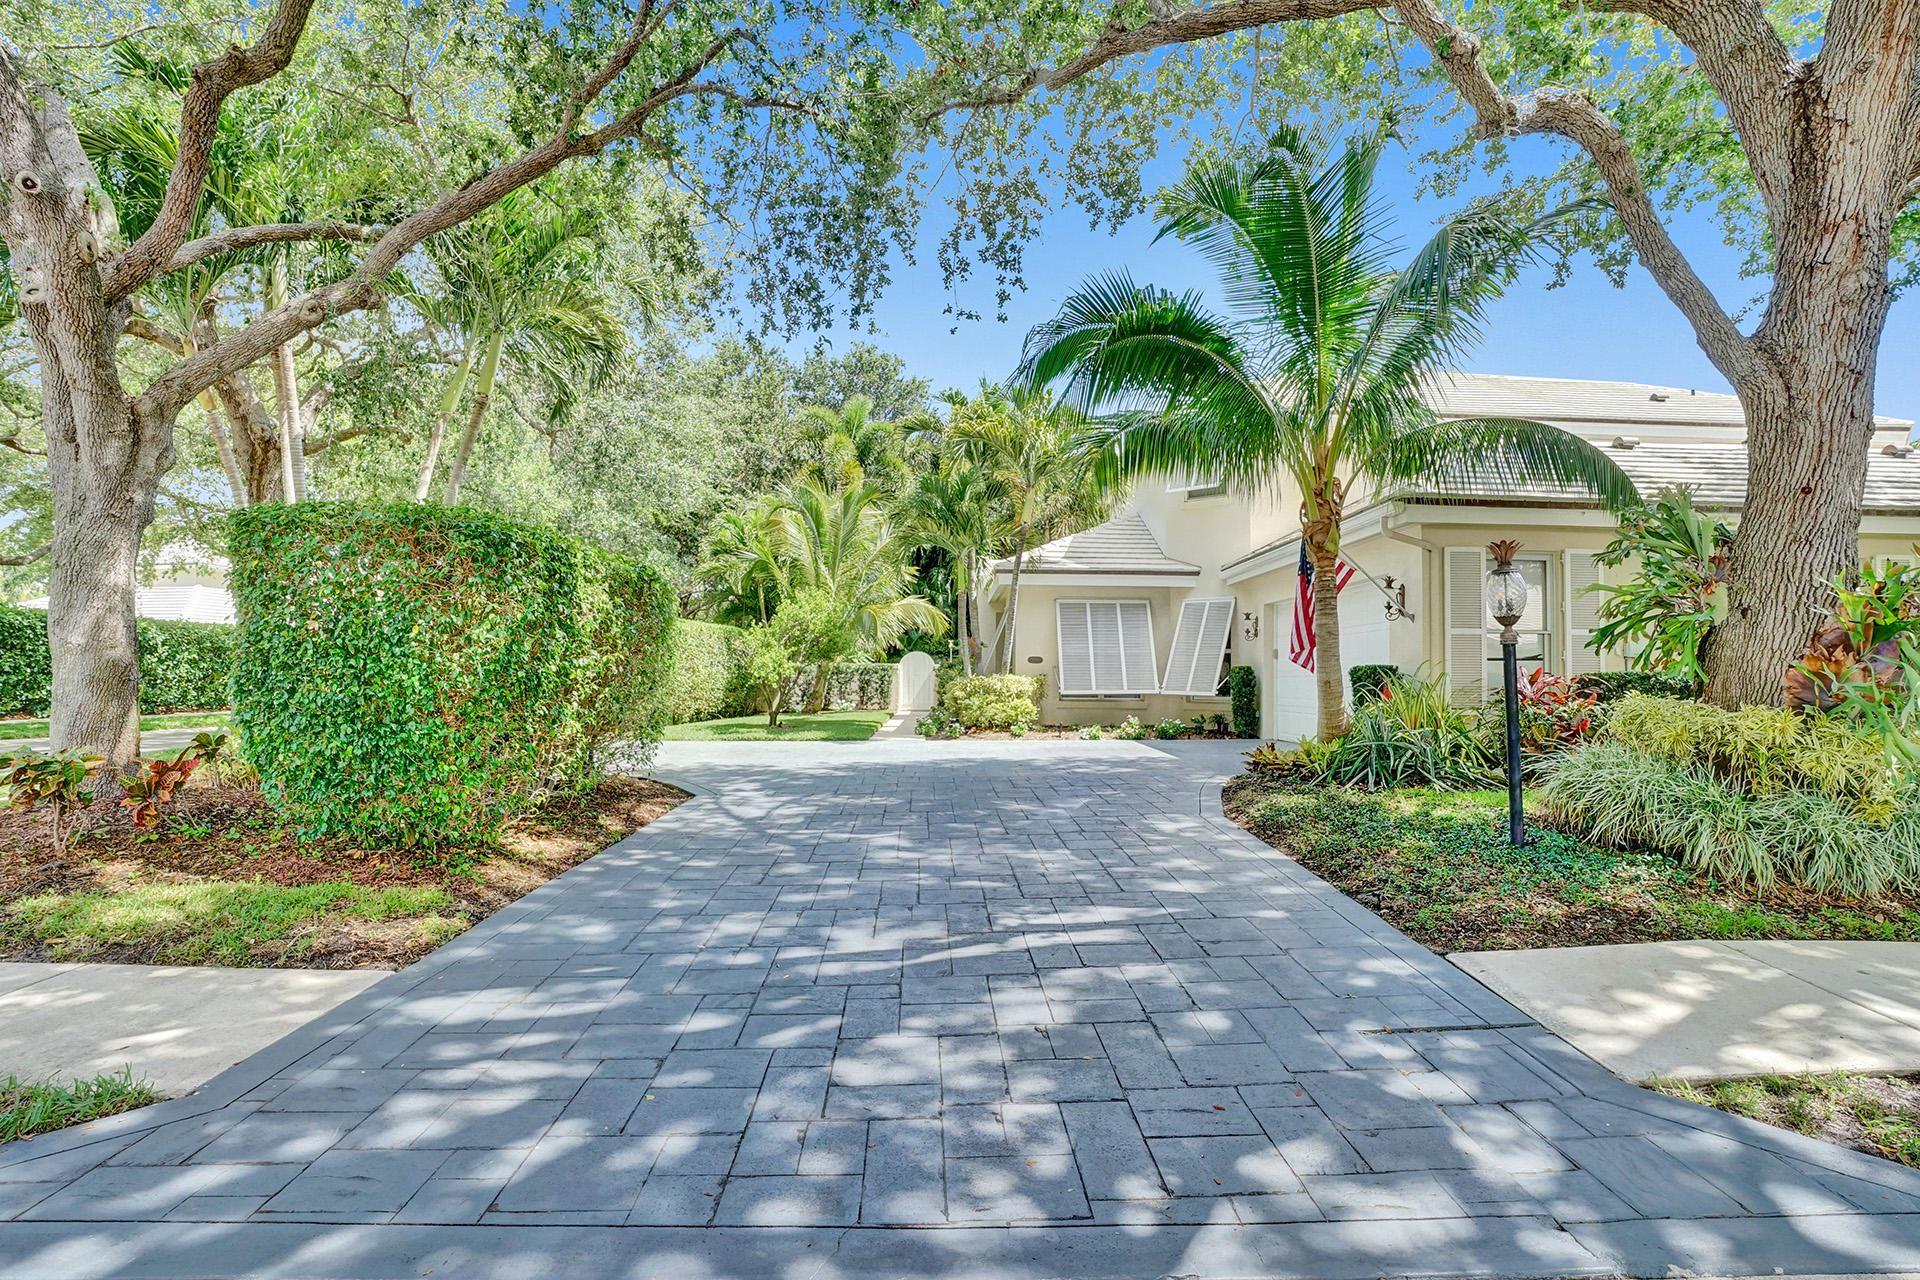 Photo of 2701 Cypress Island Drive, Palm Beach Gardens, FL 33410 (MLS # RX-10716364)